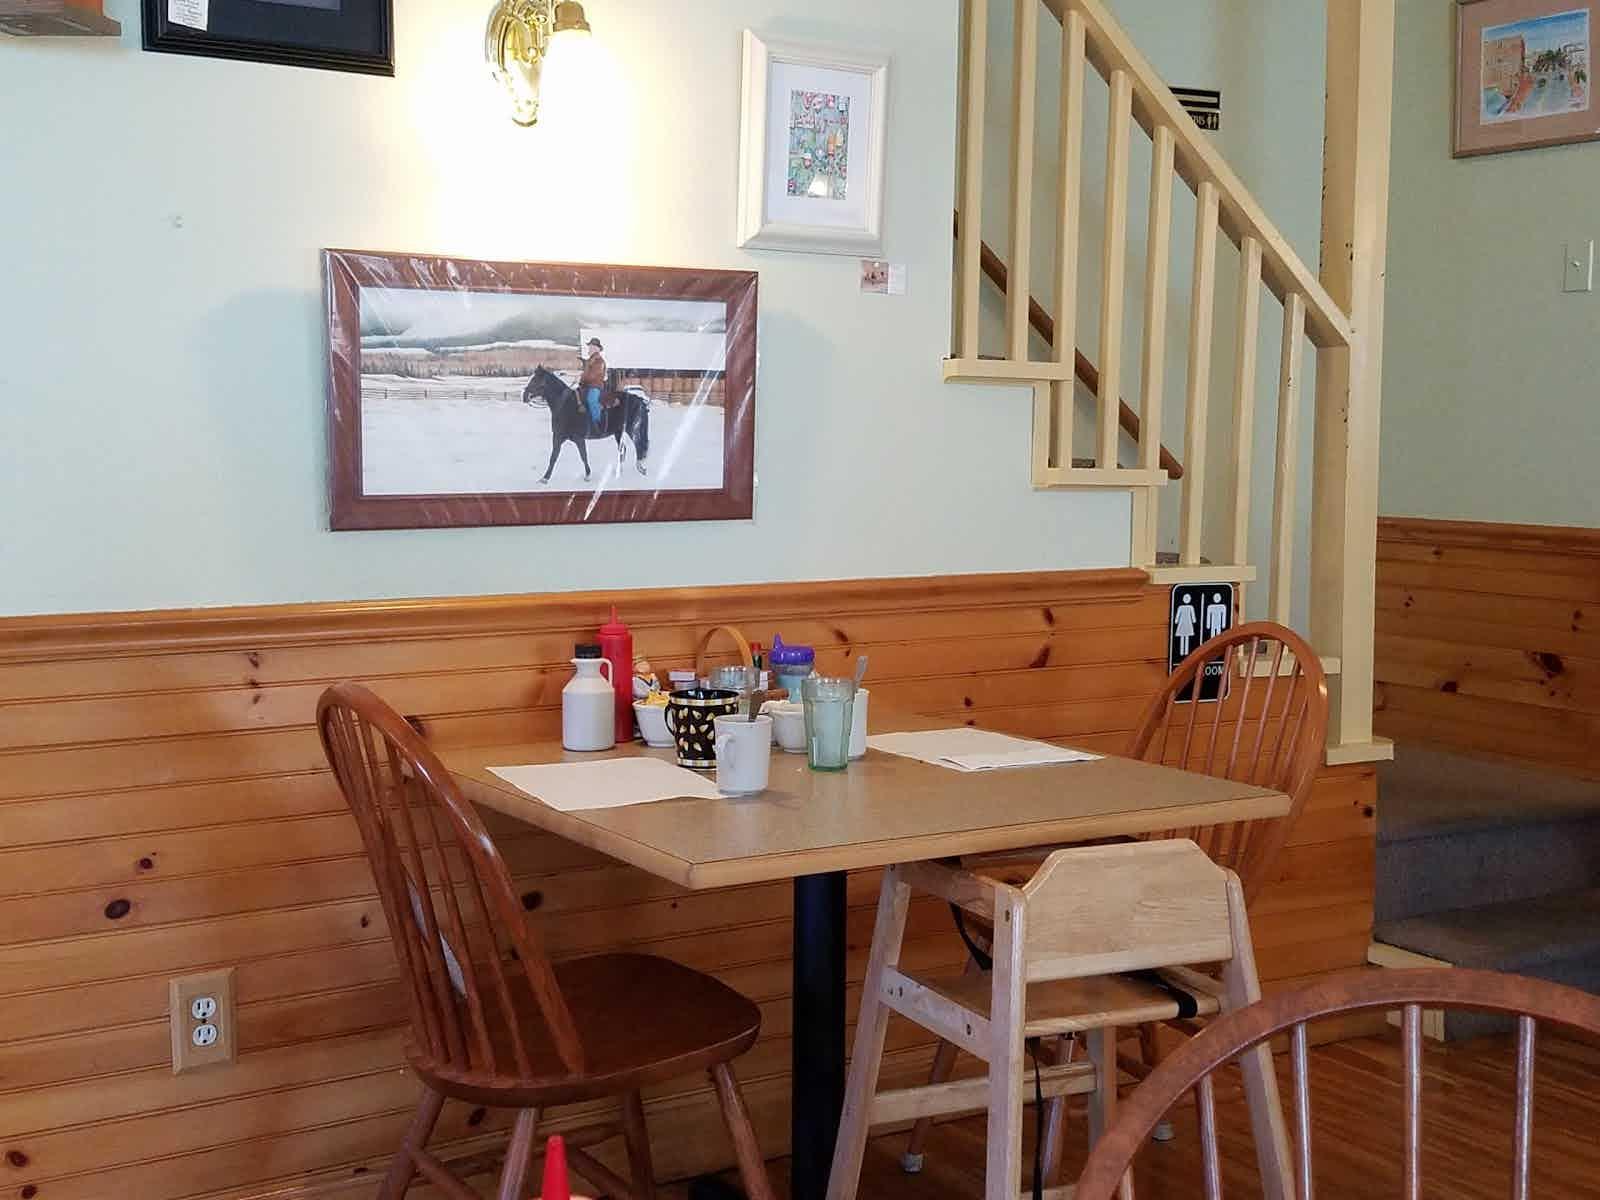 All Day Breakfast   Kennebunk | Restaurant Review   Zagat